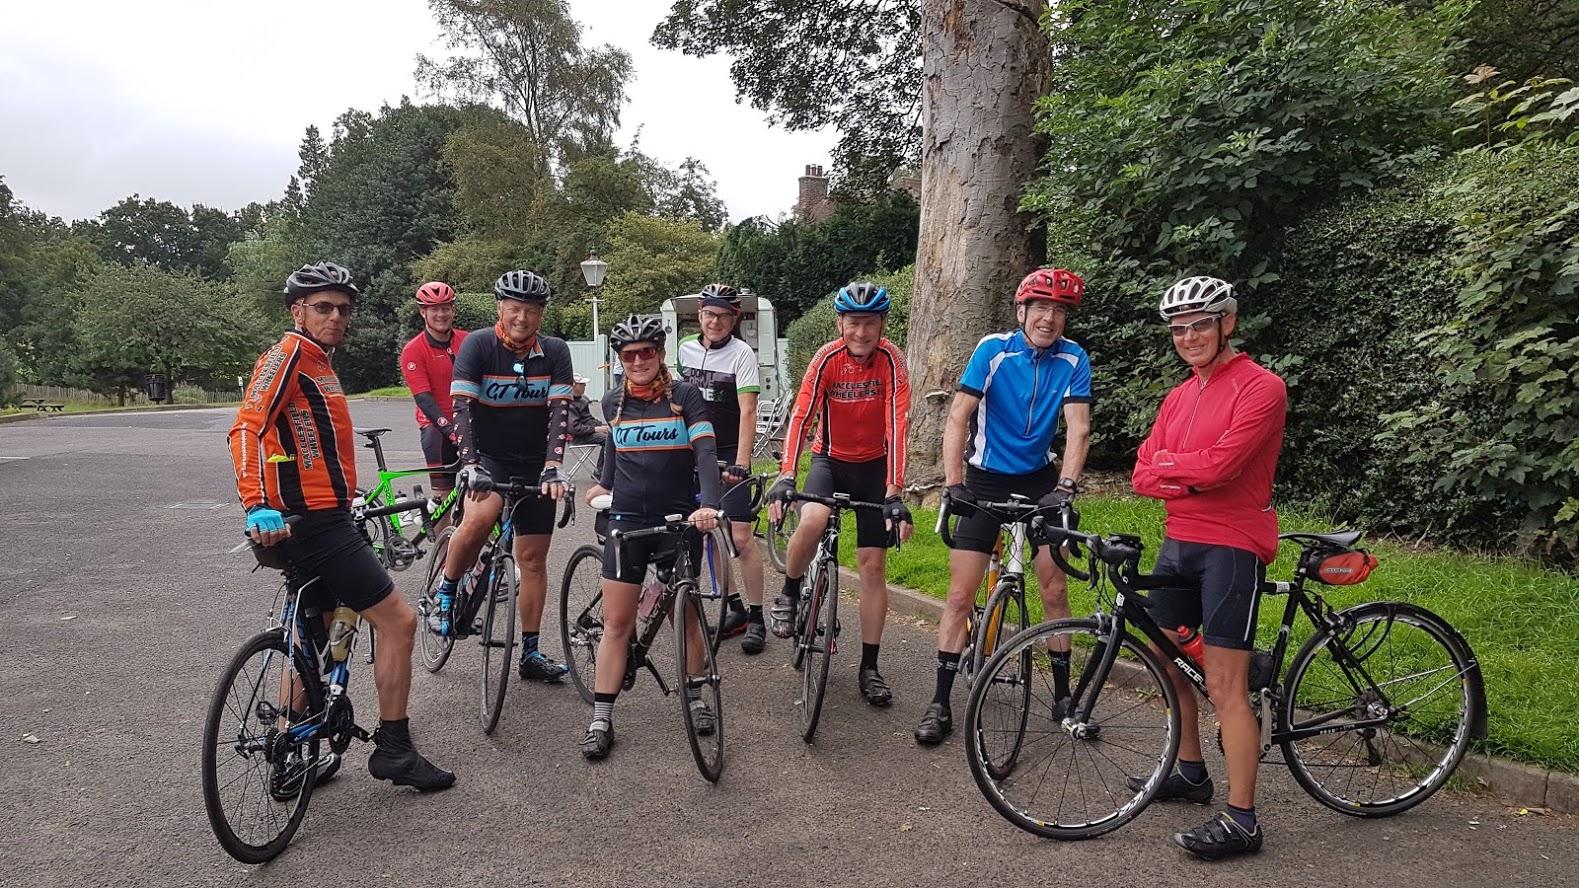 John, Oliver, Graham, Becky, Dave, Dave, Raph, Hail Ride Leader Moray. Count the Garmins.